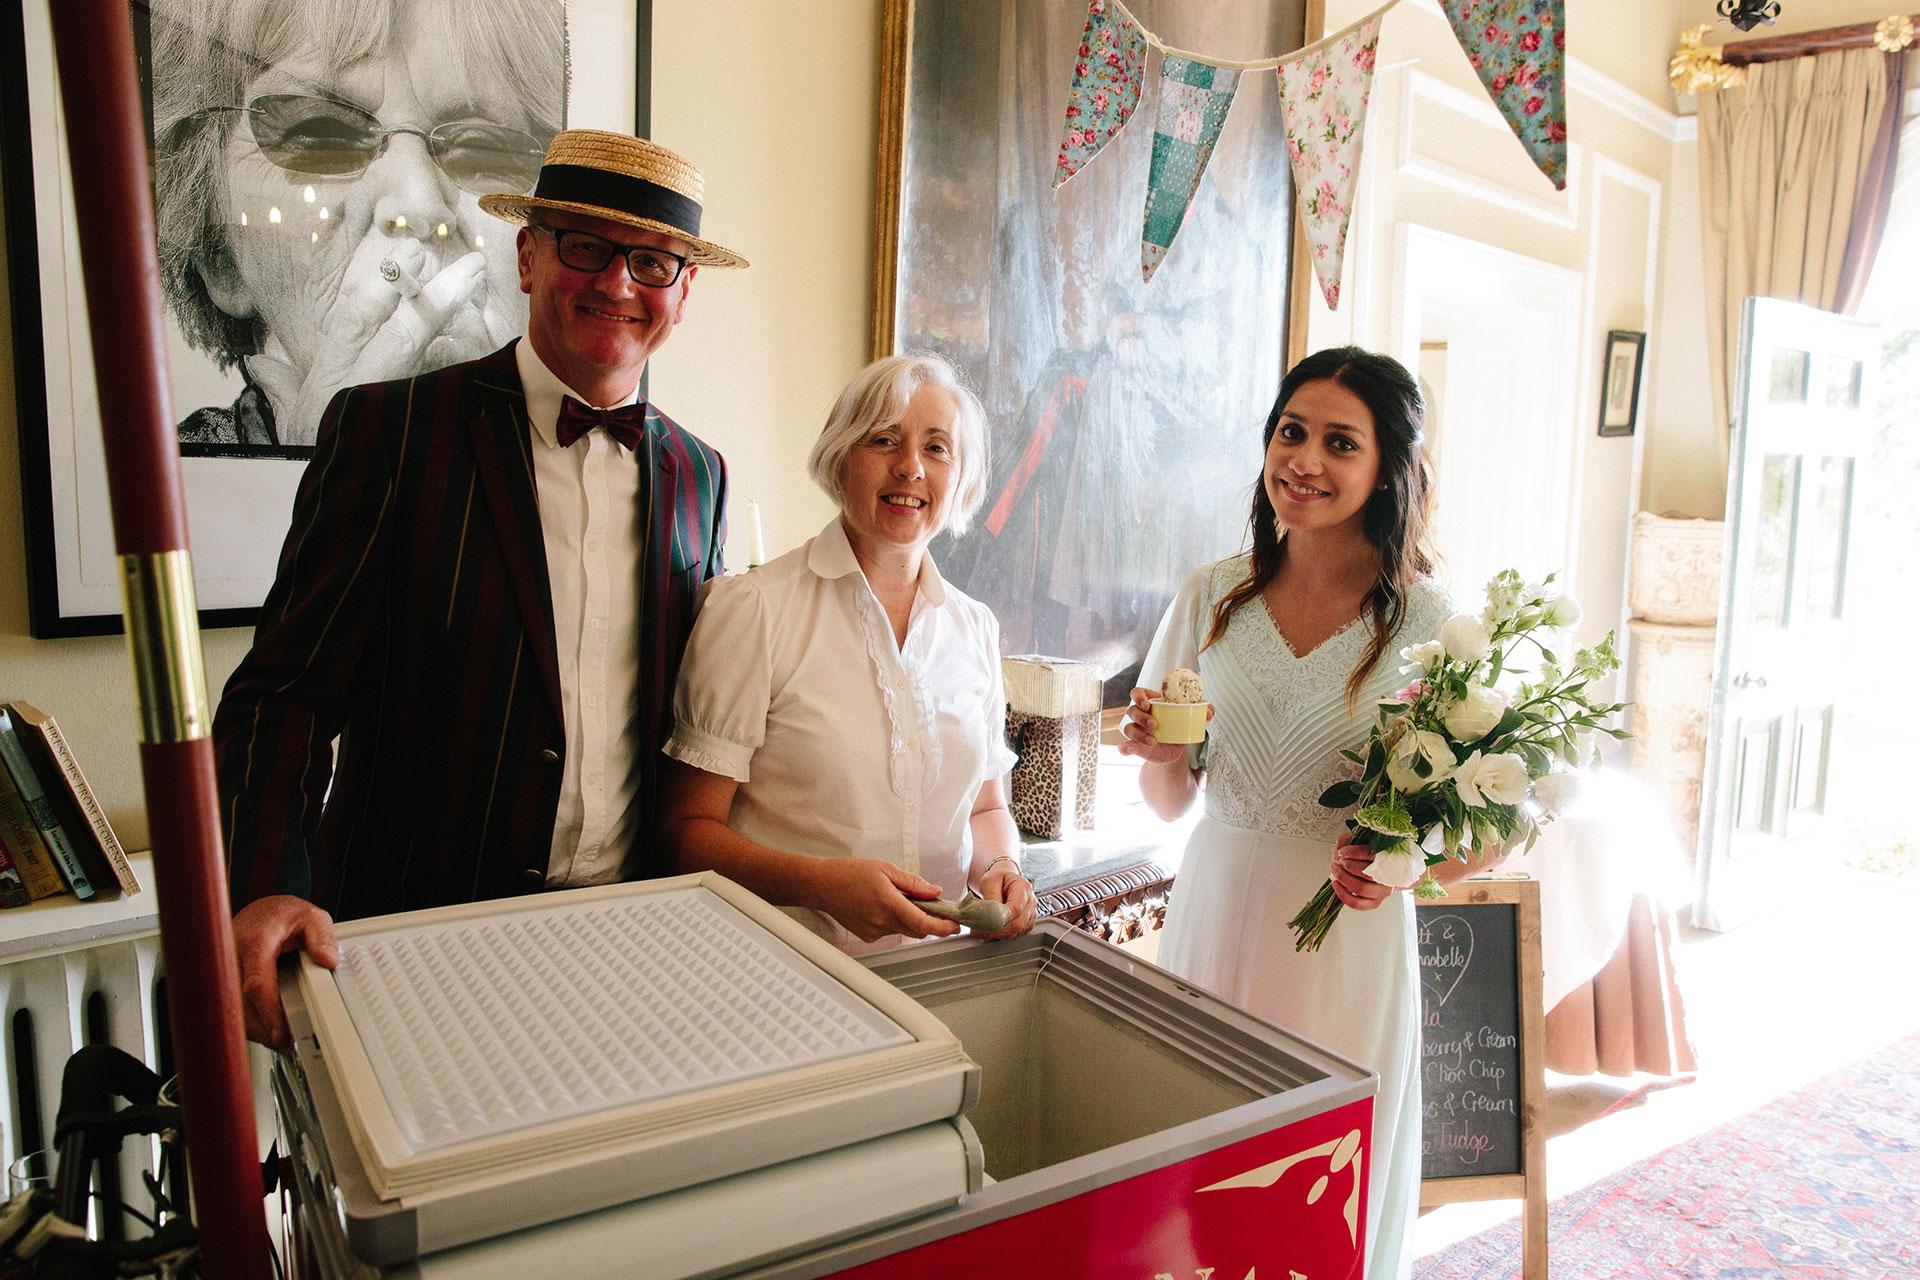 Langar-Hall-wedding-photographer-in-Nottinghamshire-Michael-Newington-Gray-72.jpg